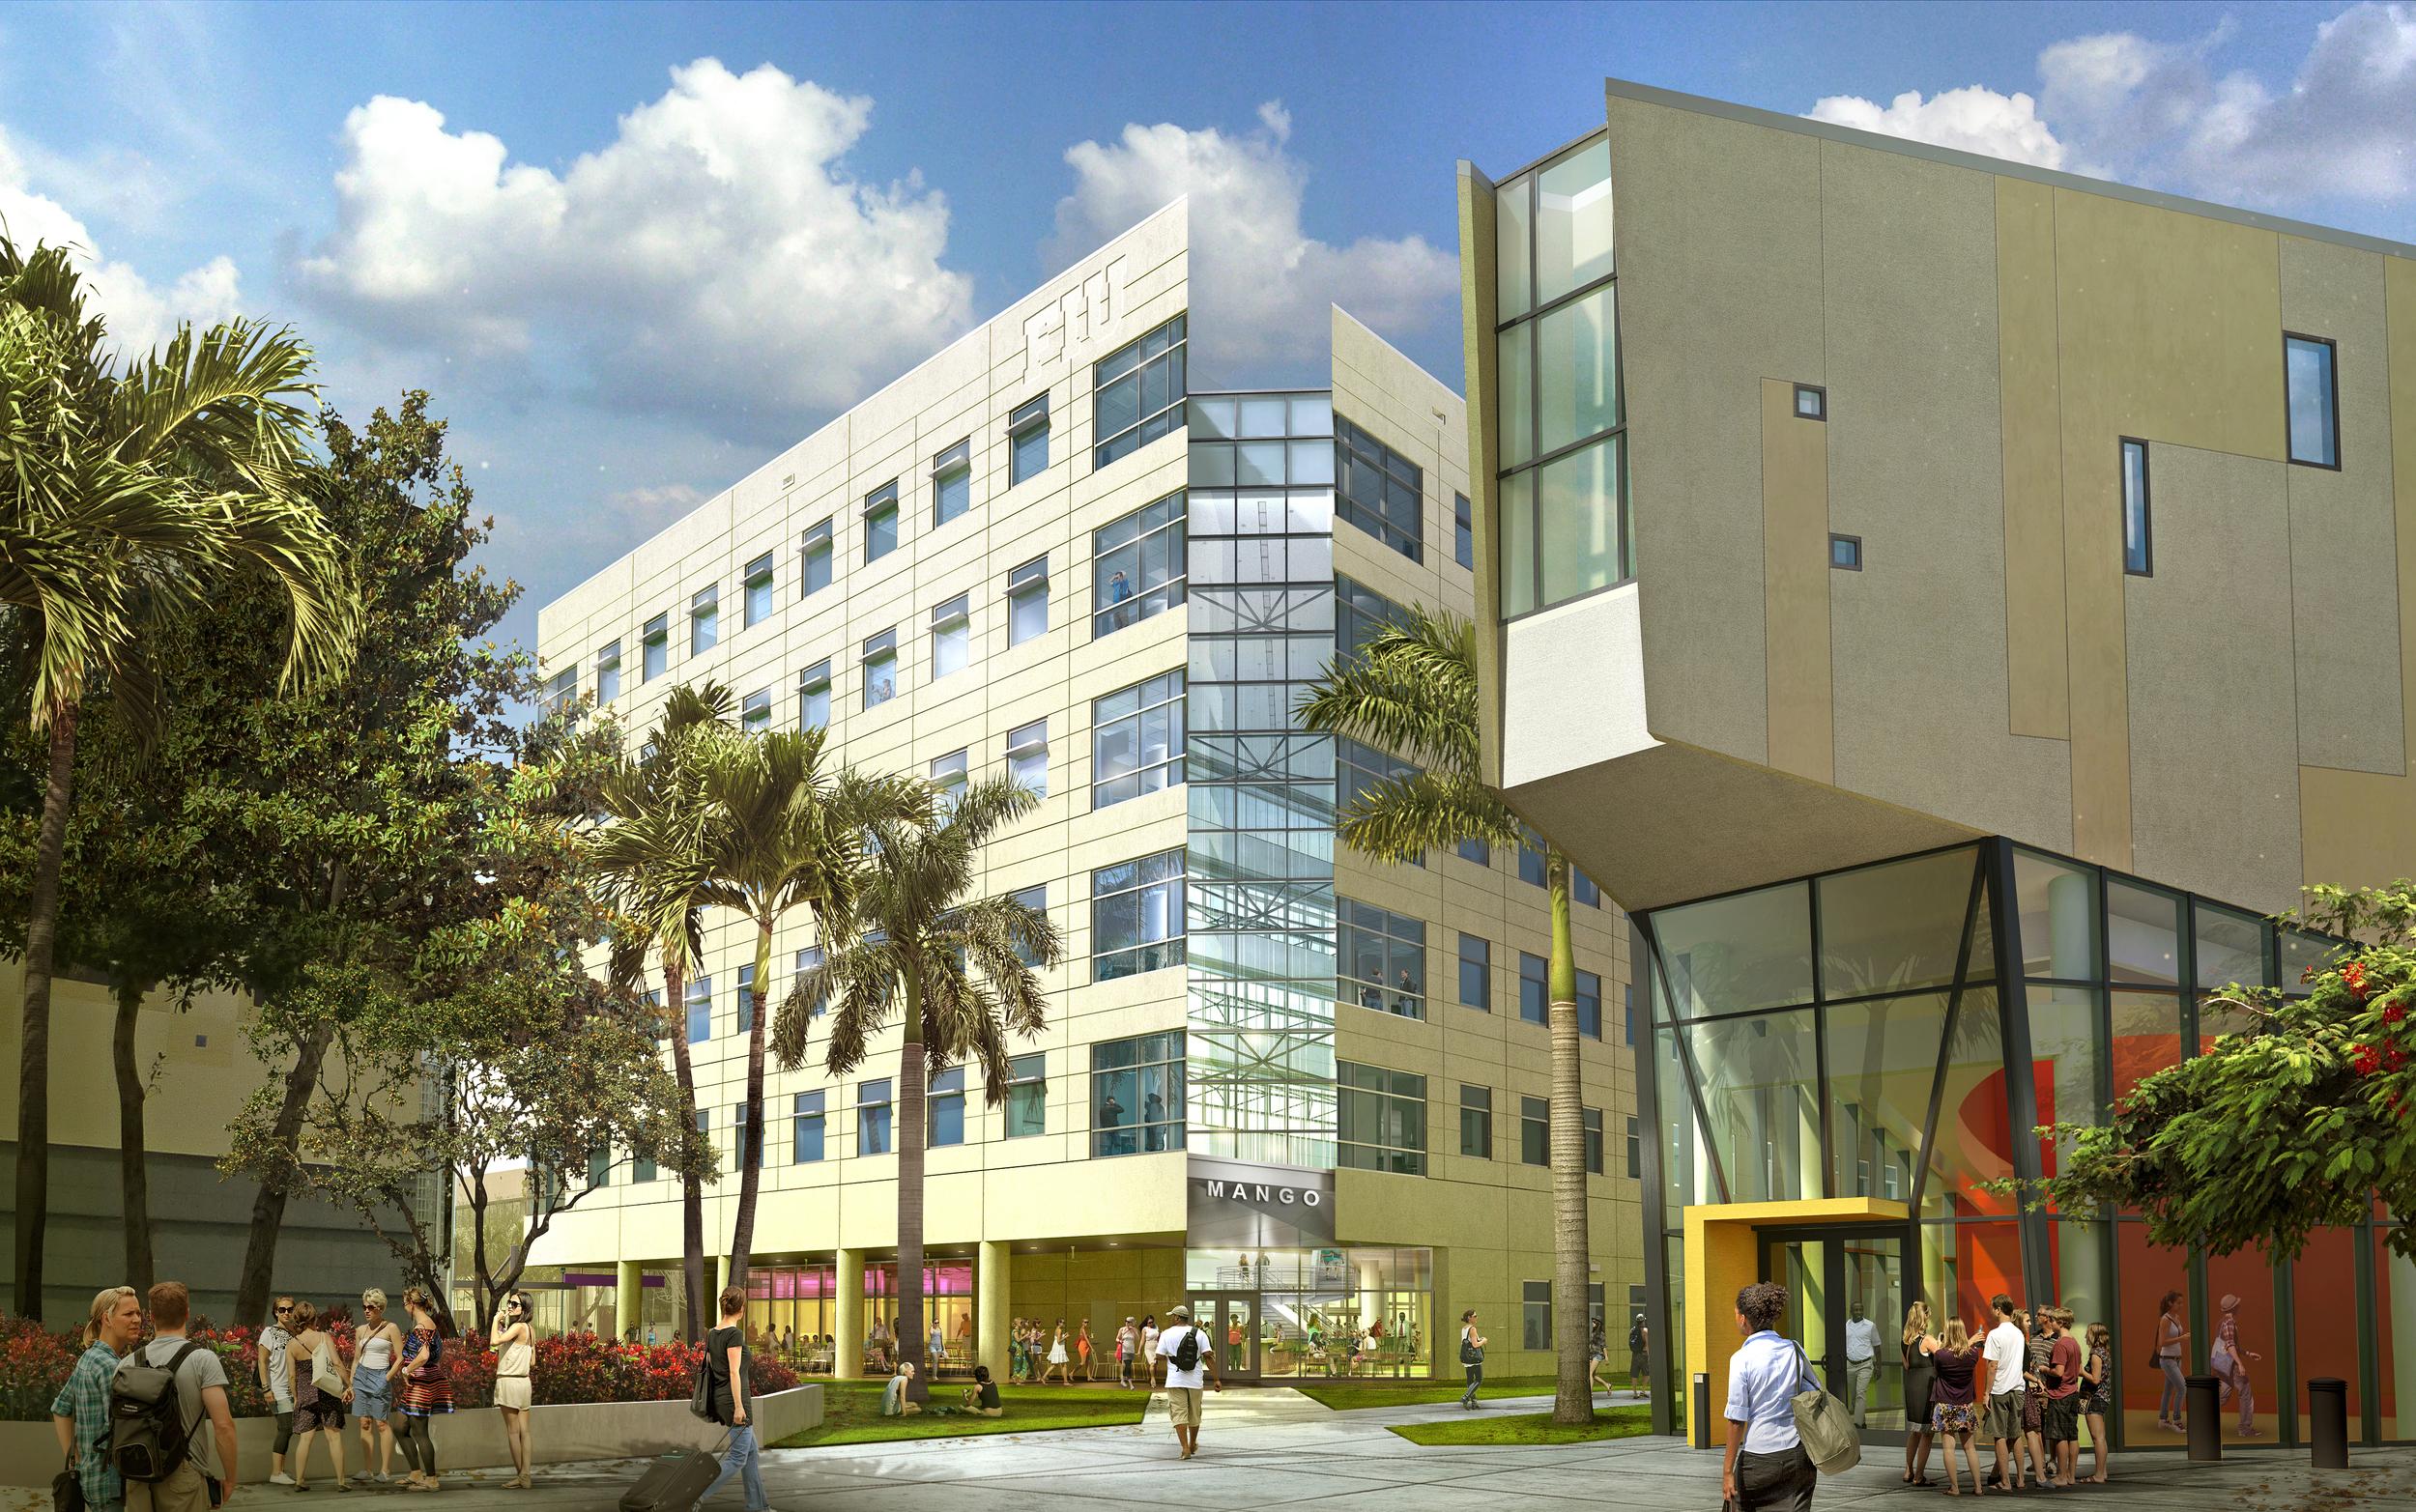 FIU MIXED USE BUILDING  Miami, FL | Image courtesy of HOK Tampa